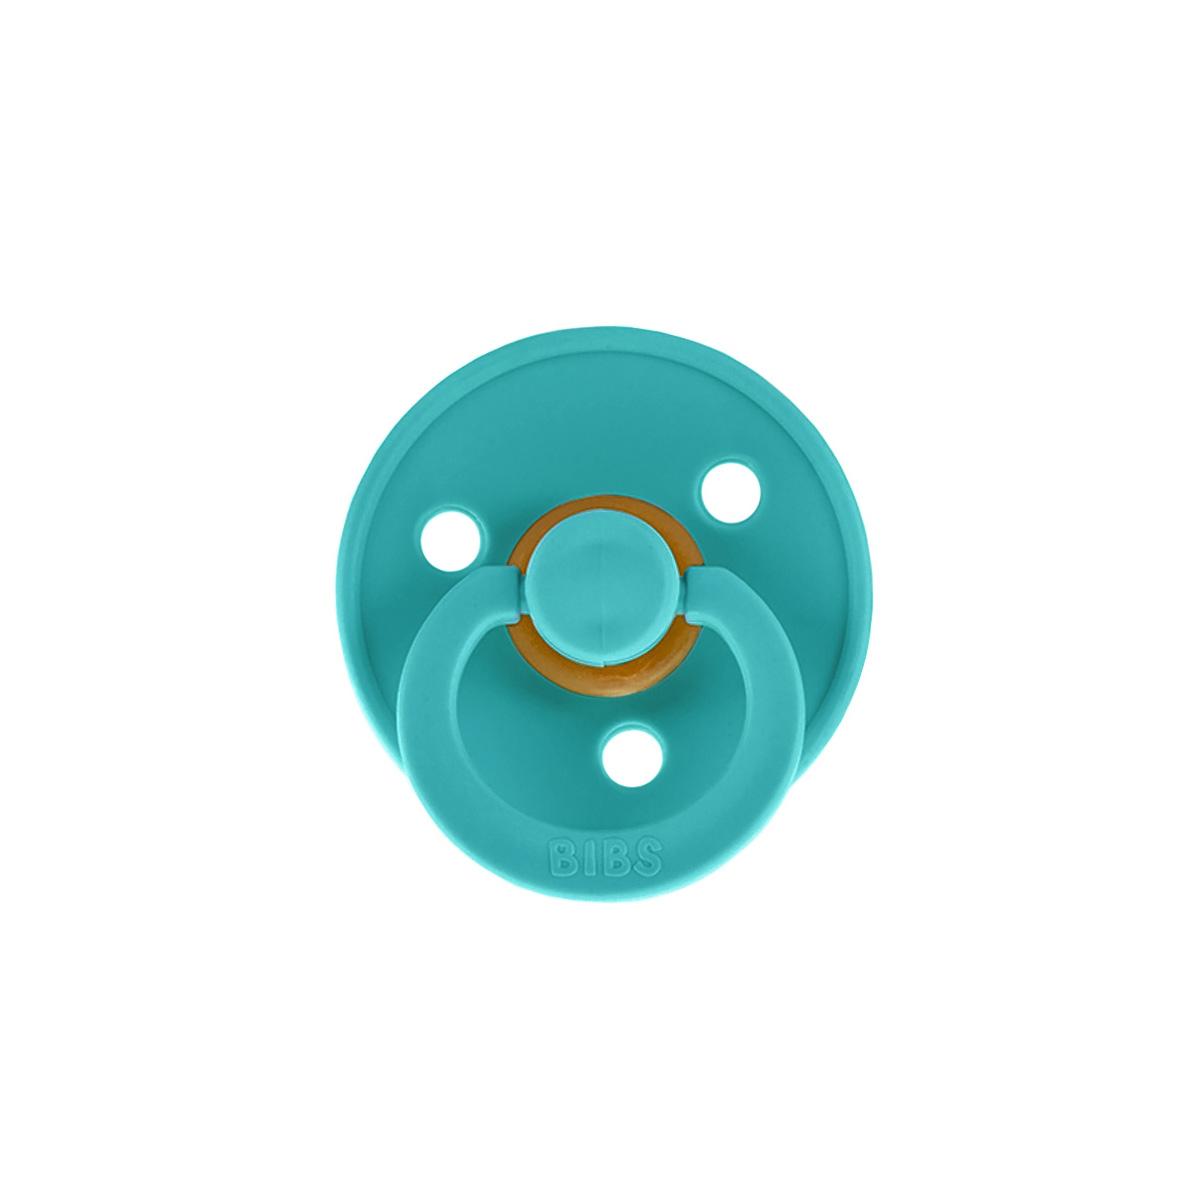 Chupete Bibs Turquoise